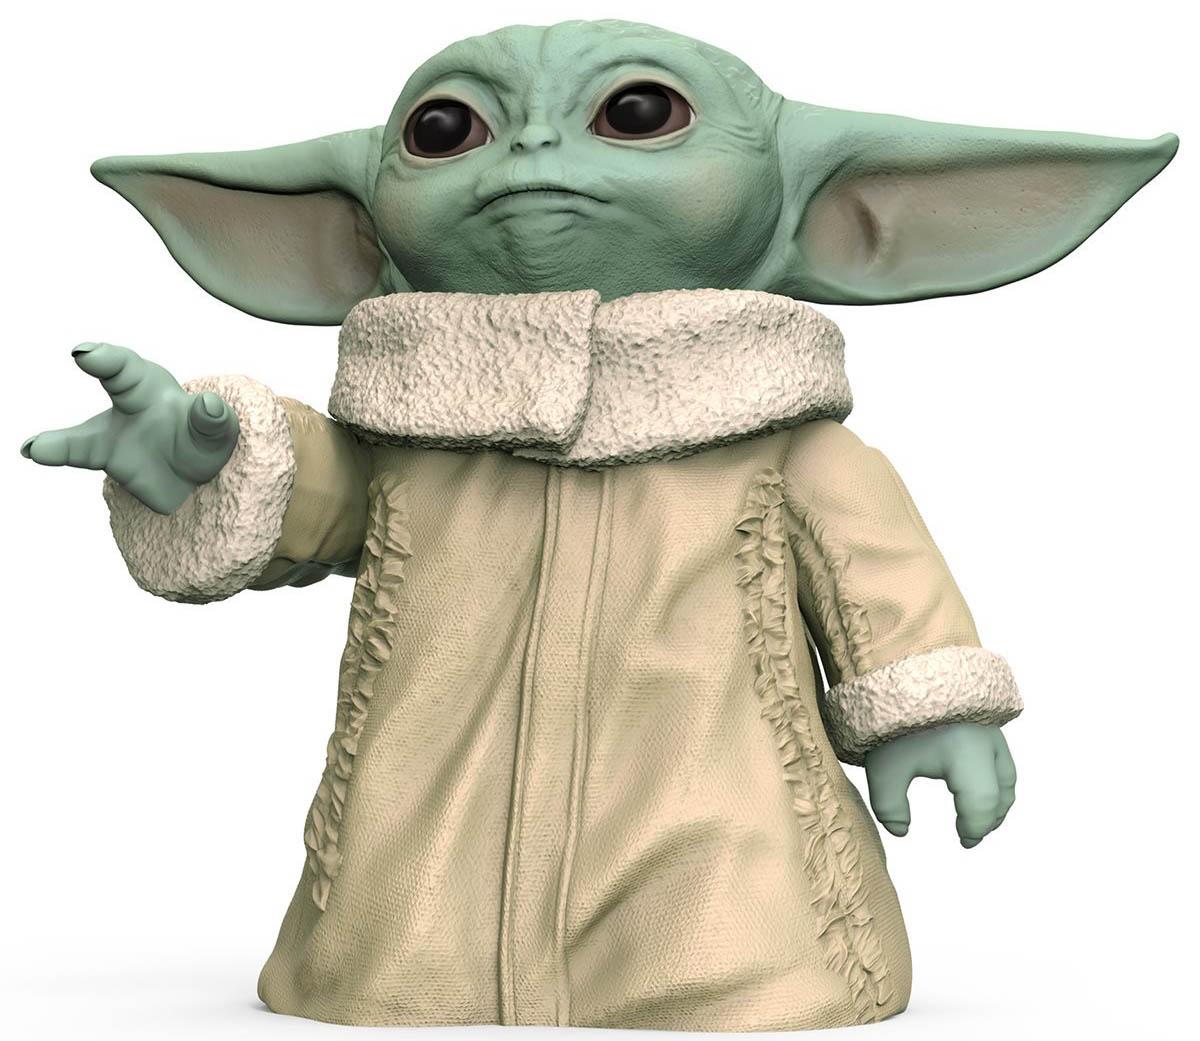 Hasbro - Star Wars - The Mandalorian - Baby Yoda - Action Figure - 6-5-inch Baby Yoda - 01